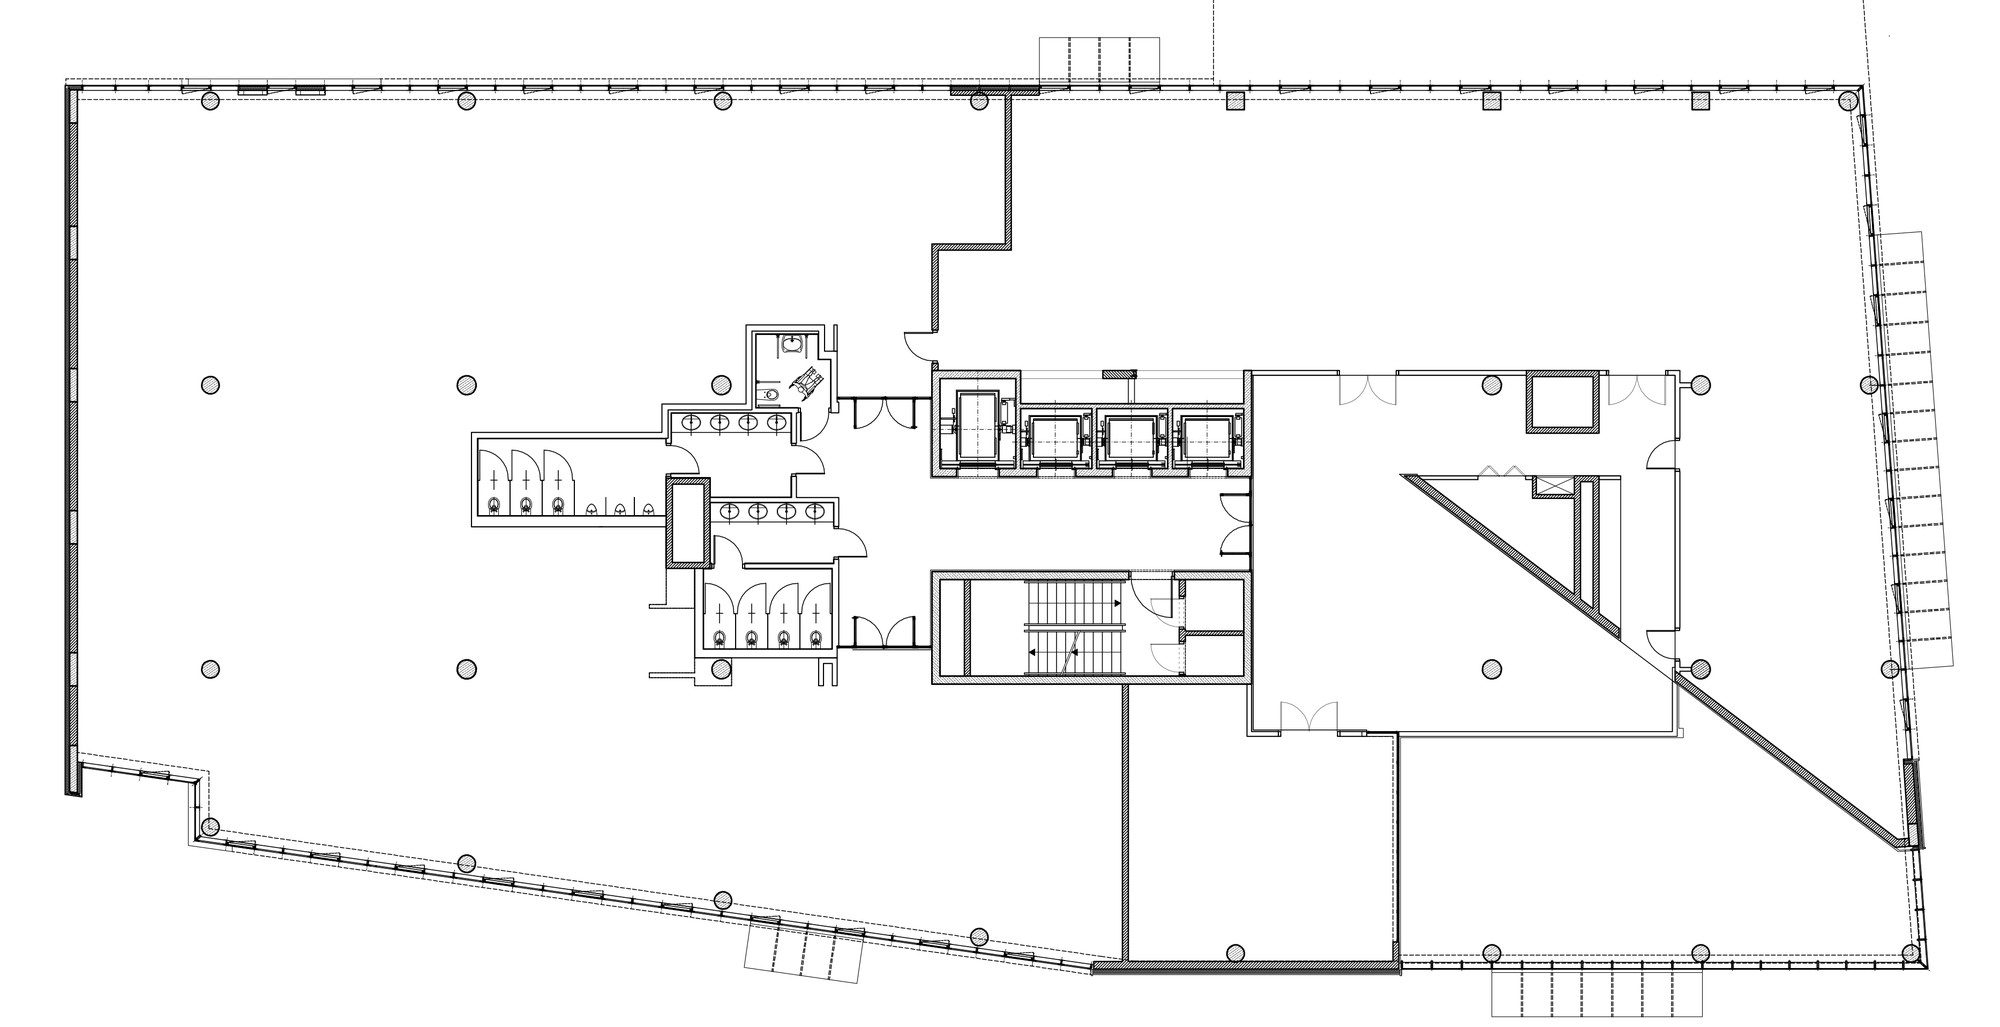 Office Building Floor Plans: Office Building At Grzybowska Street / Grupa 5 Architekci